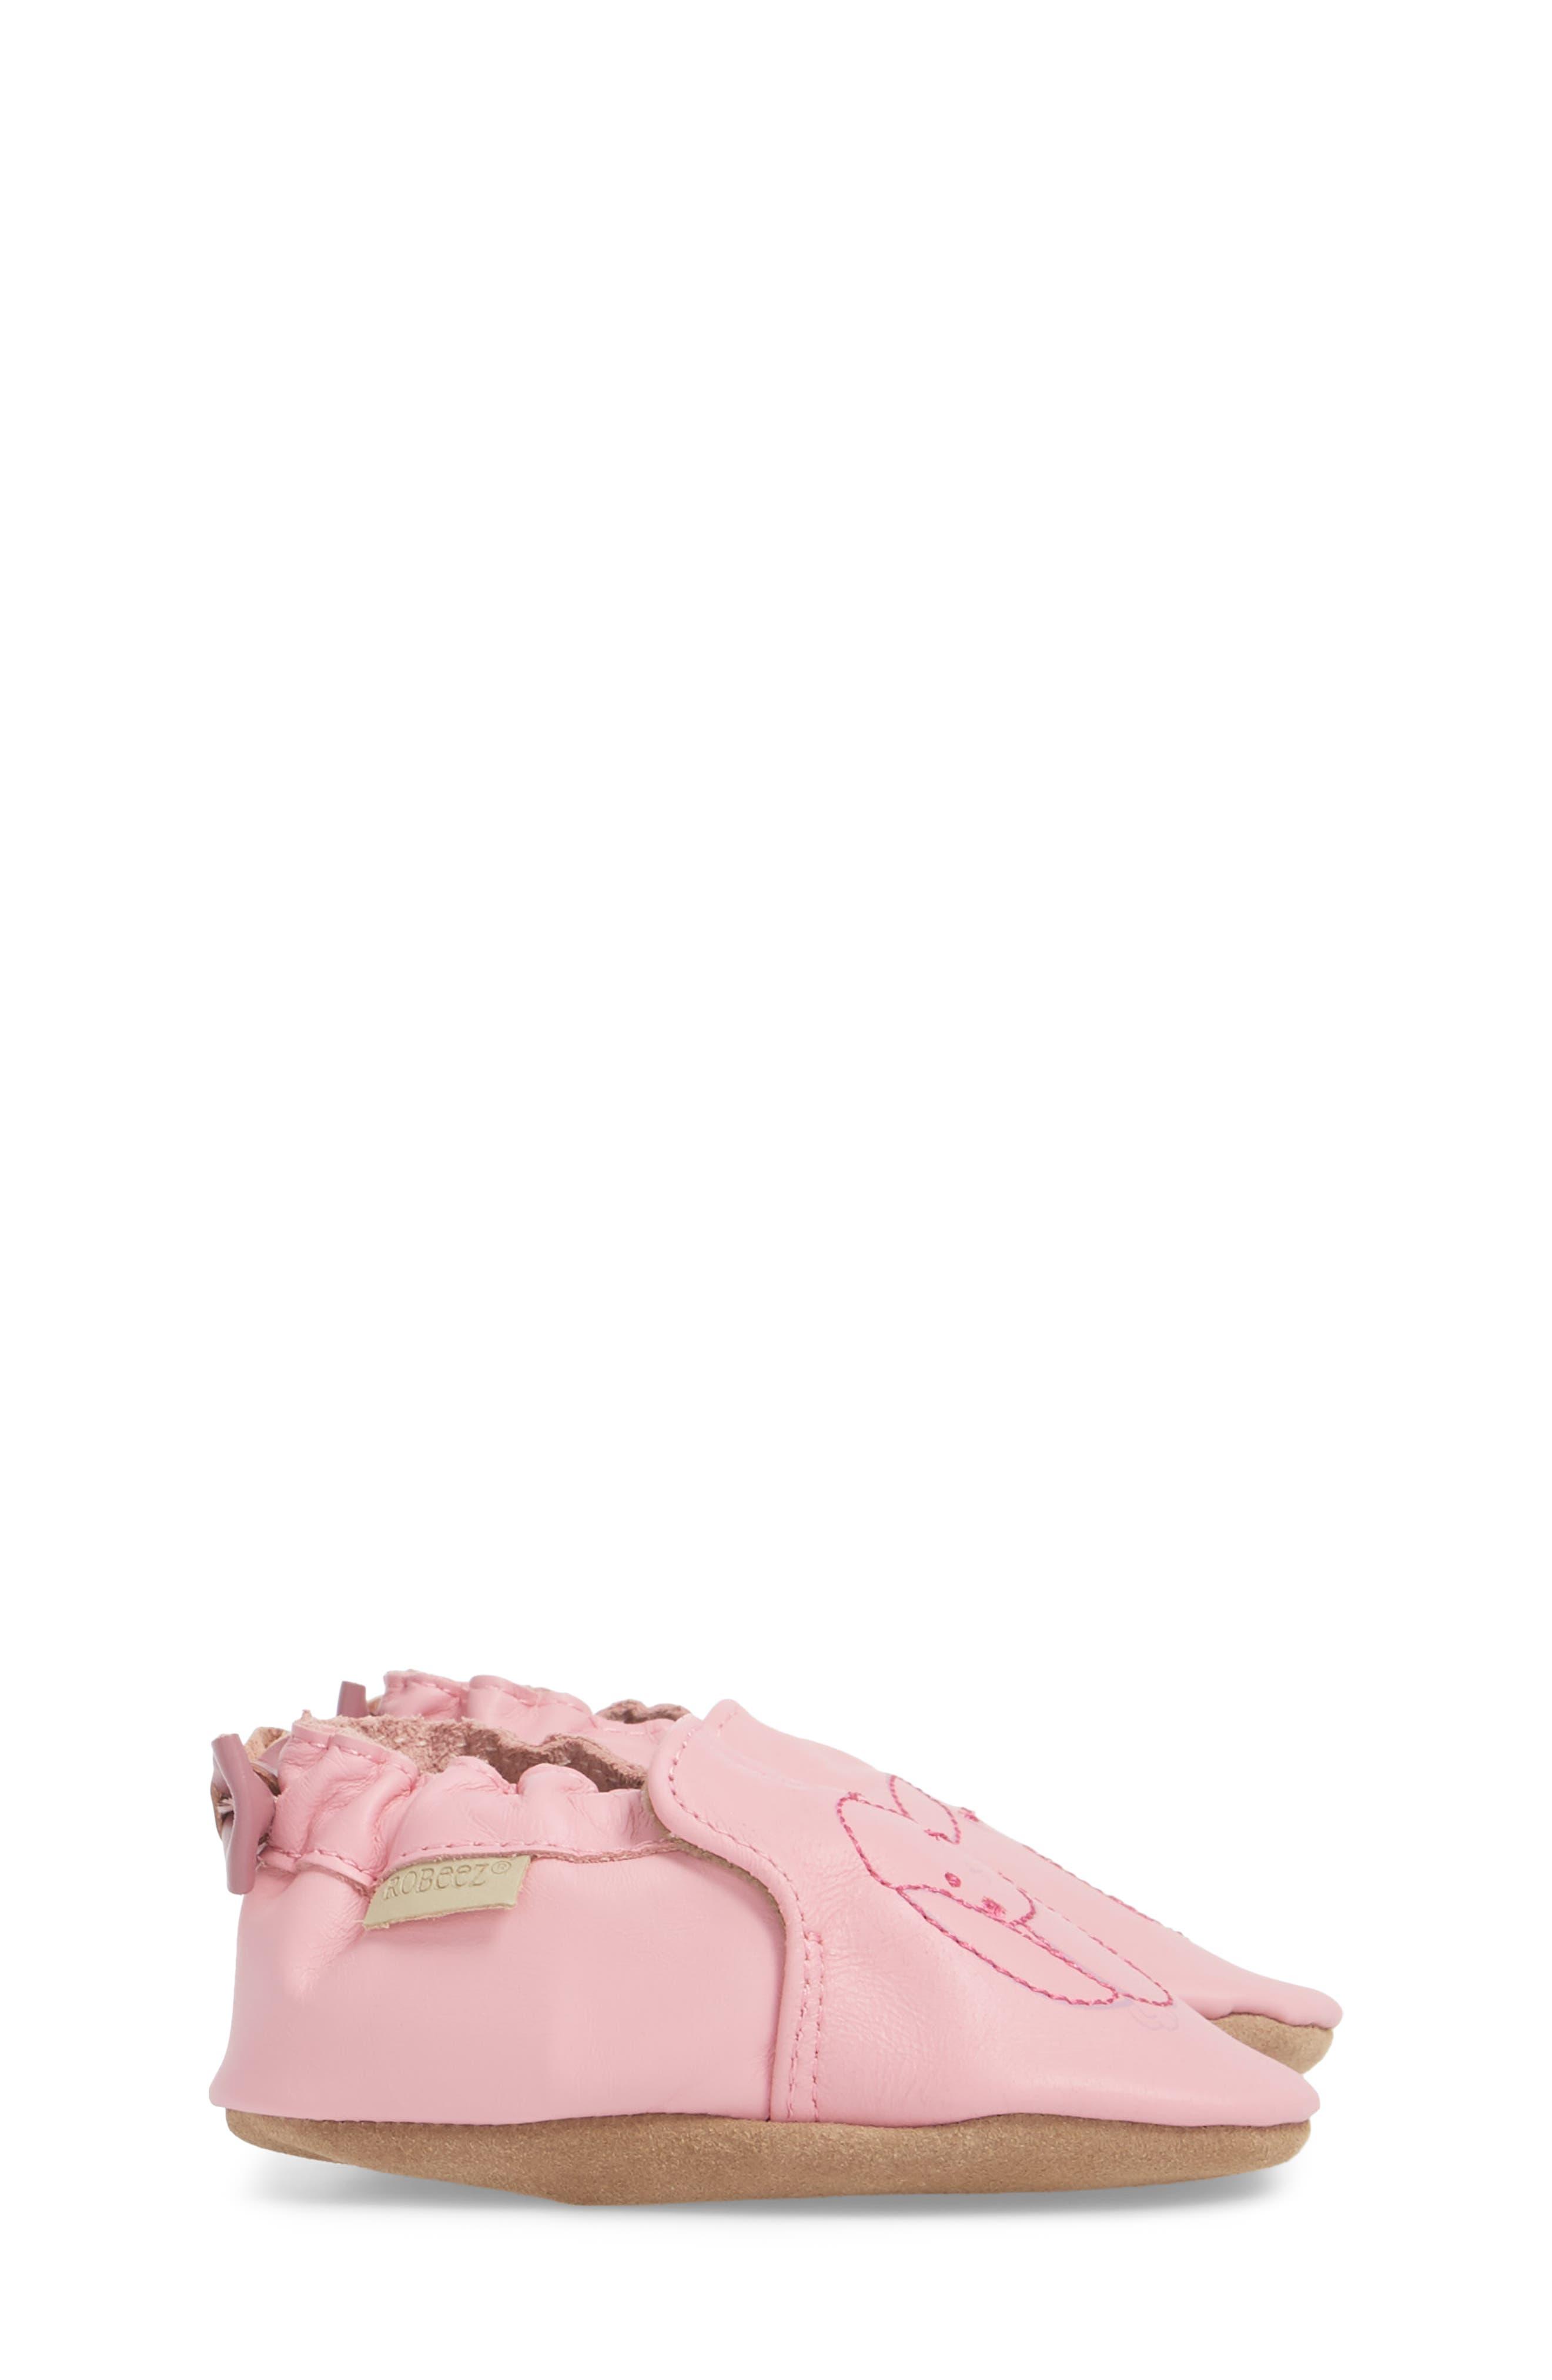 Sweet Bunny Moccasin Crib Shoe,                             Alternate thumbnail 4, color,                             Pastel Pink